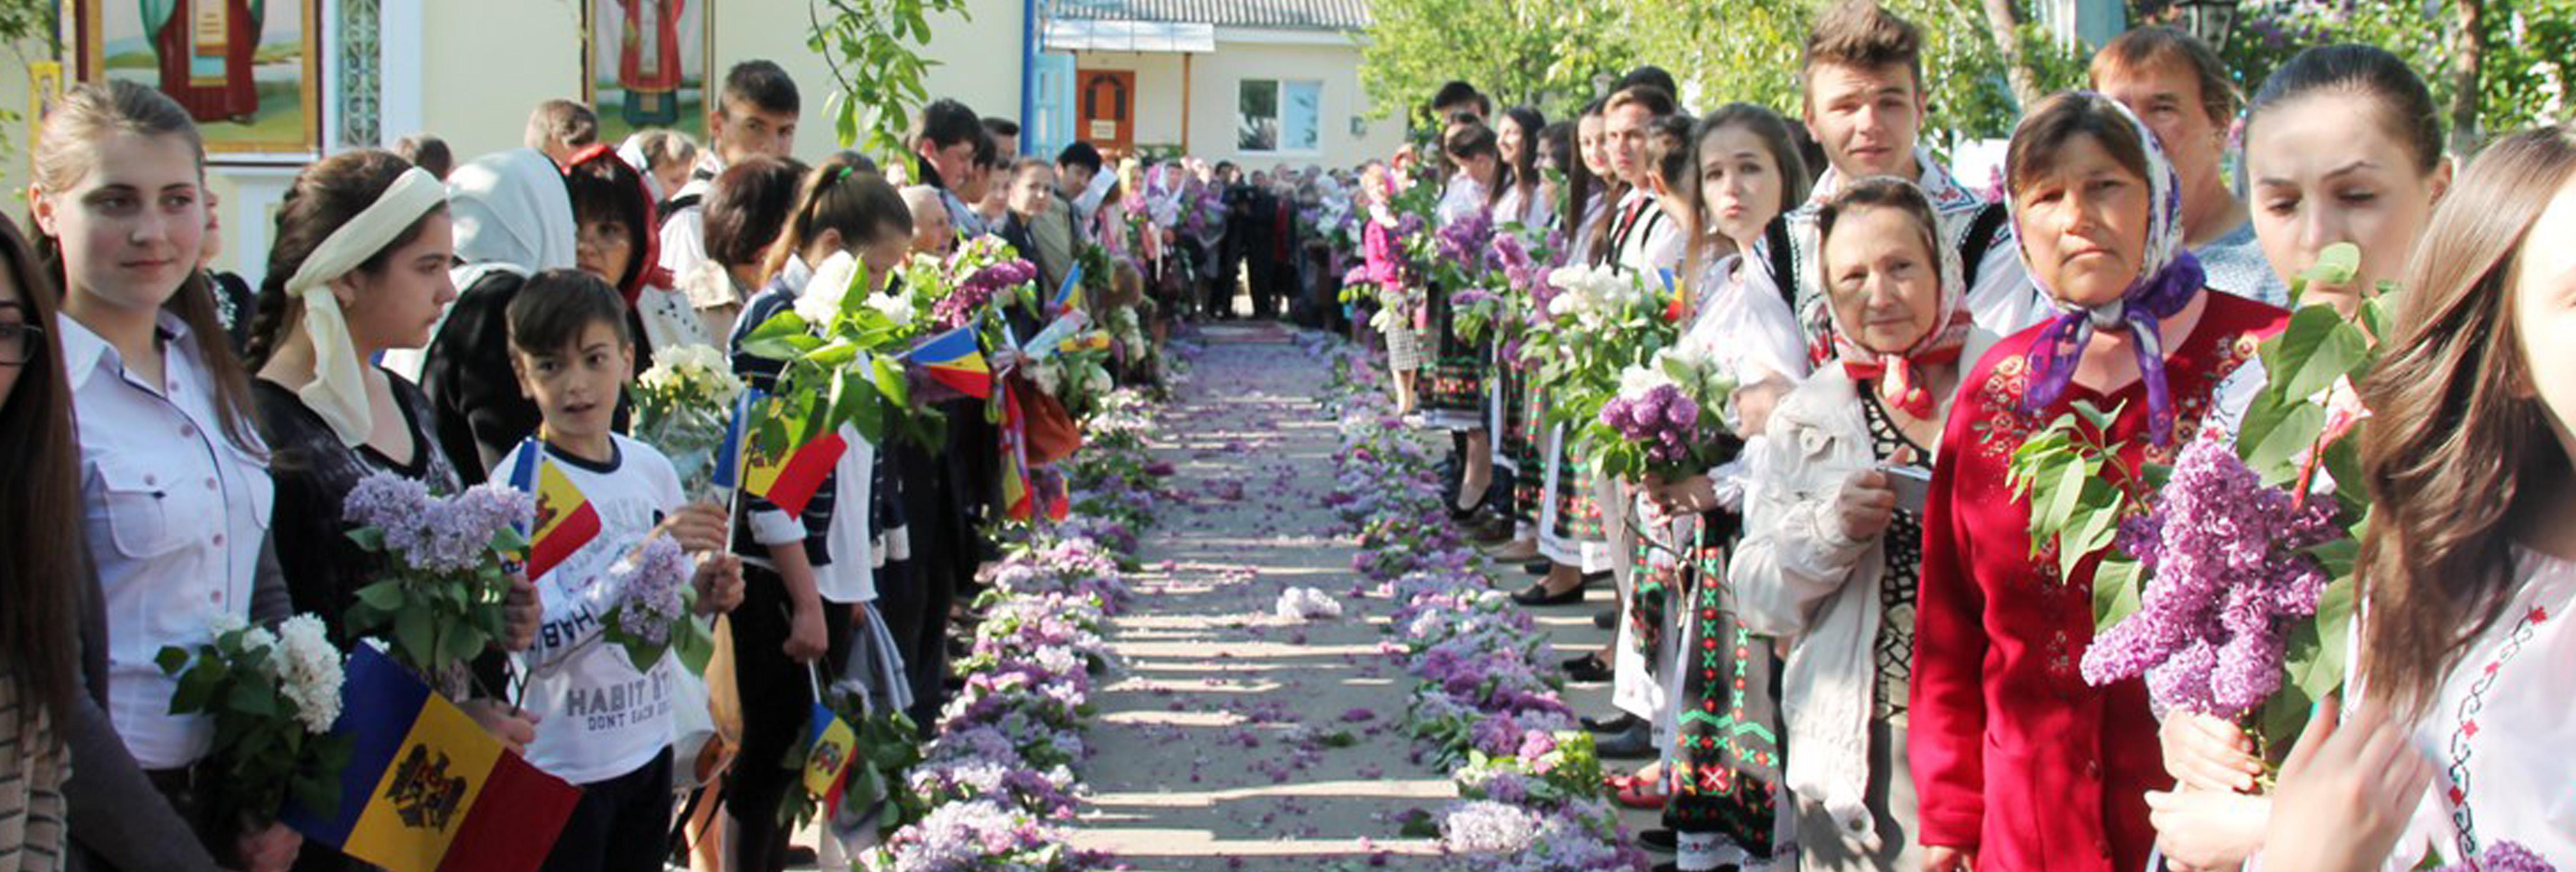 Biserica Sfinții Arhangheli Voievozi Mihail și Gavriil Durlești credință Basarabia slider